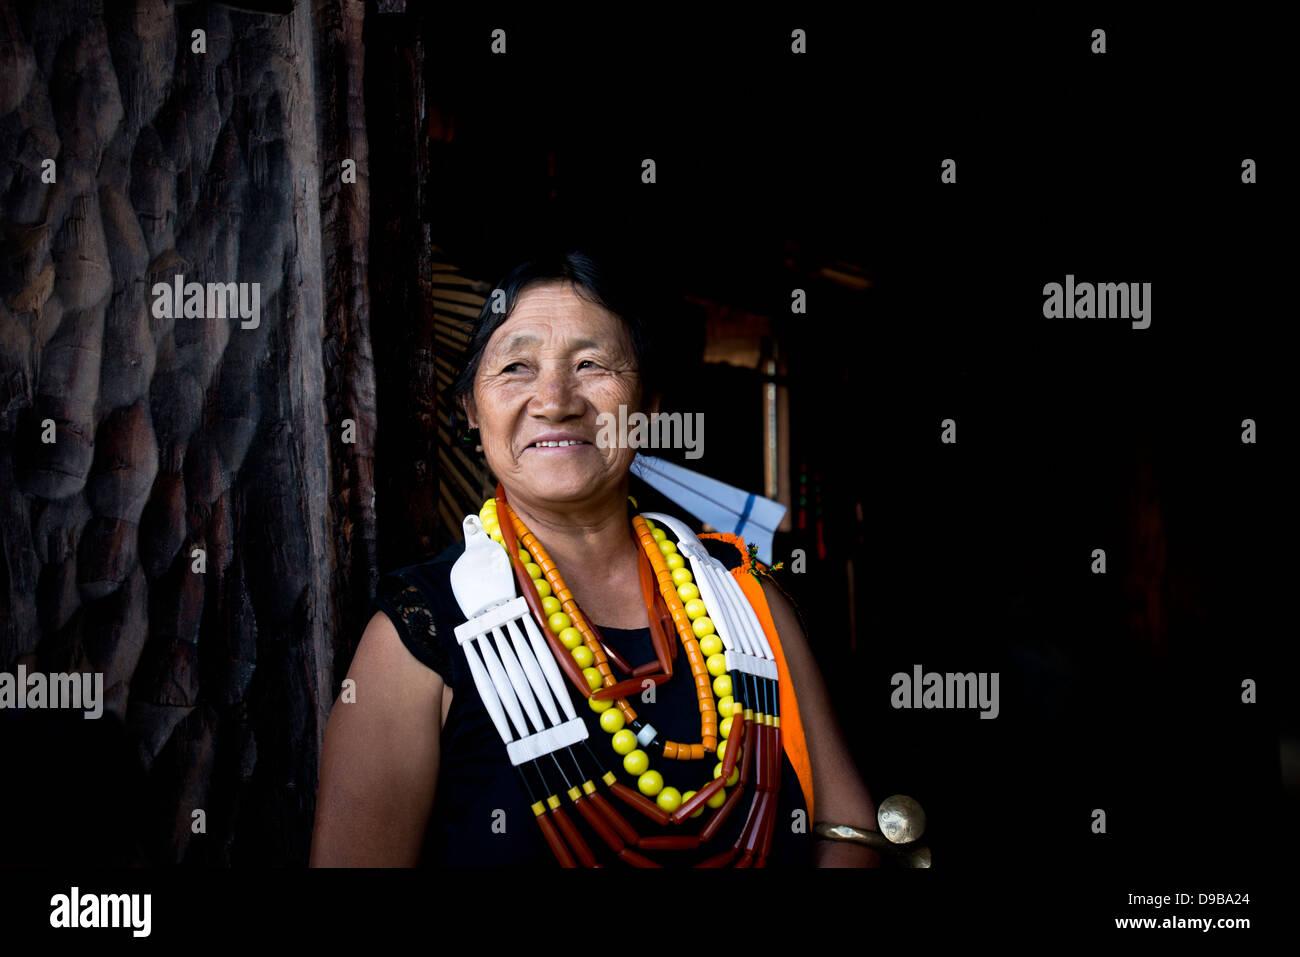 Naga tribeswoman in traditional outfit and smiling, Kisama, Kohima, Nagaland, India - Stock Image